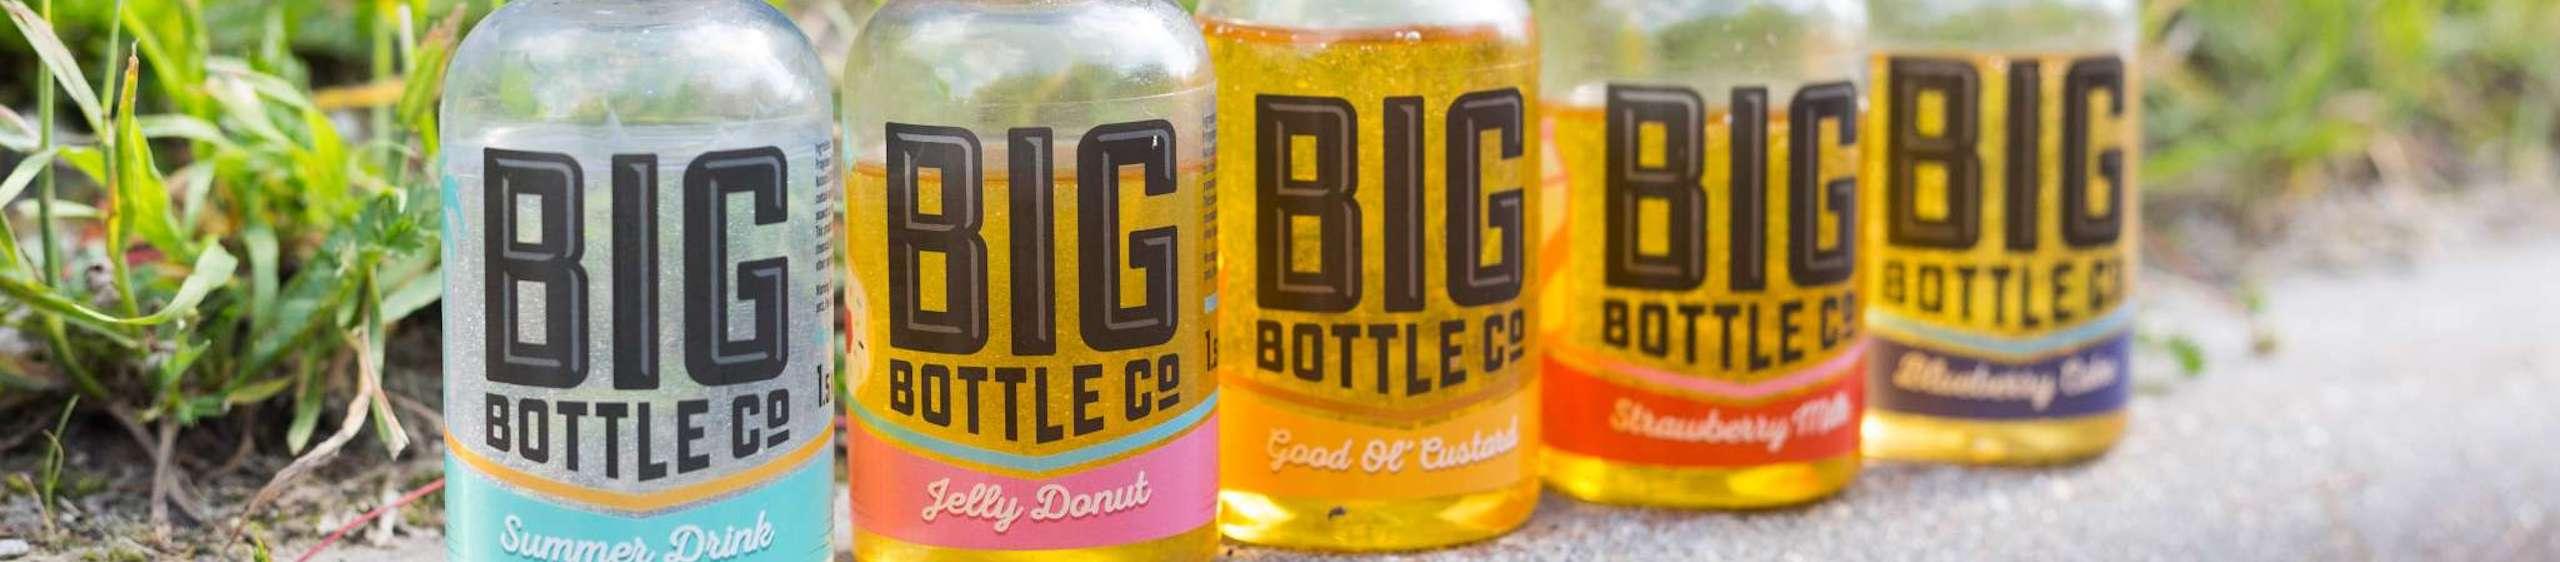 recepty-samozamesa-big-bottle-co